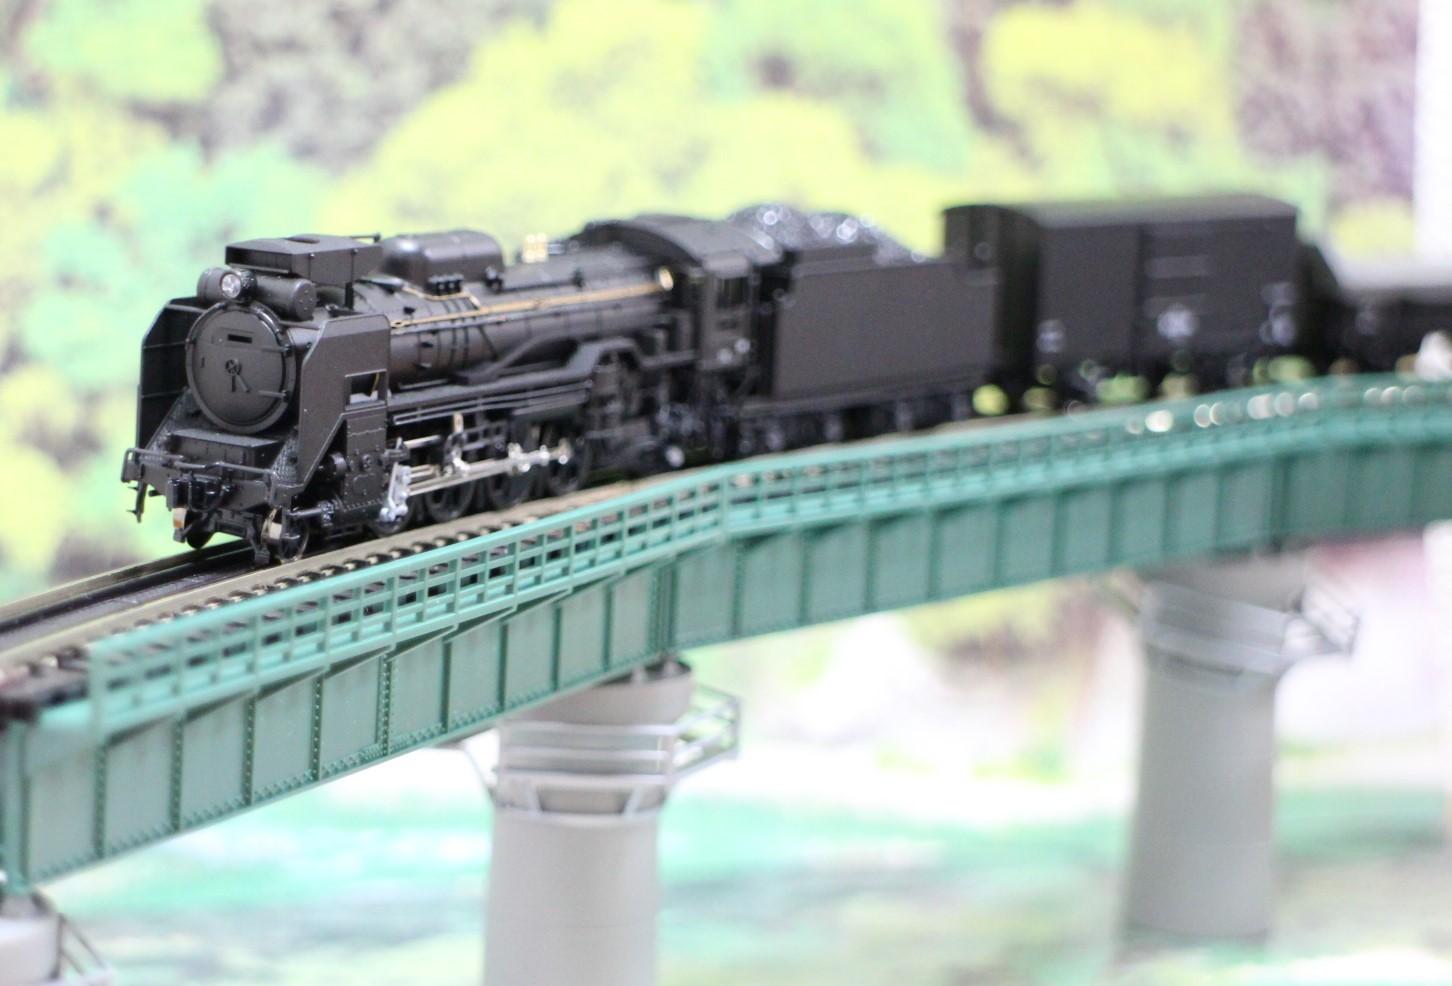 KATO のカーブ鉄橋セットを使い楽しんでみる!_a0149148_10323124.jpg